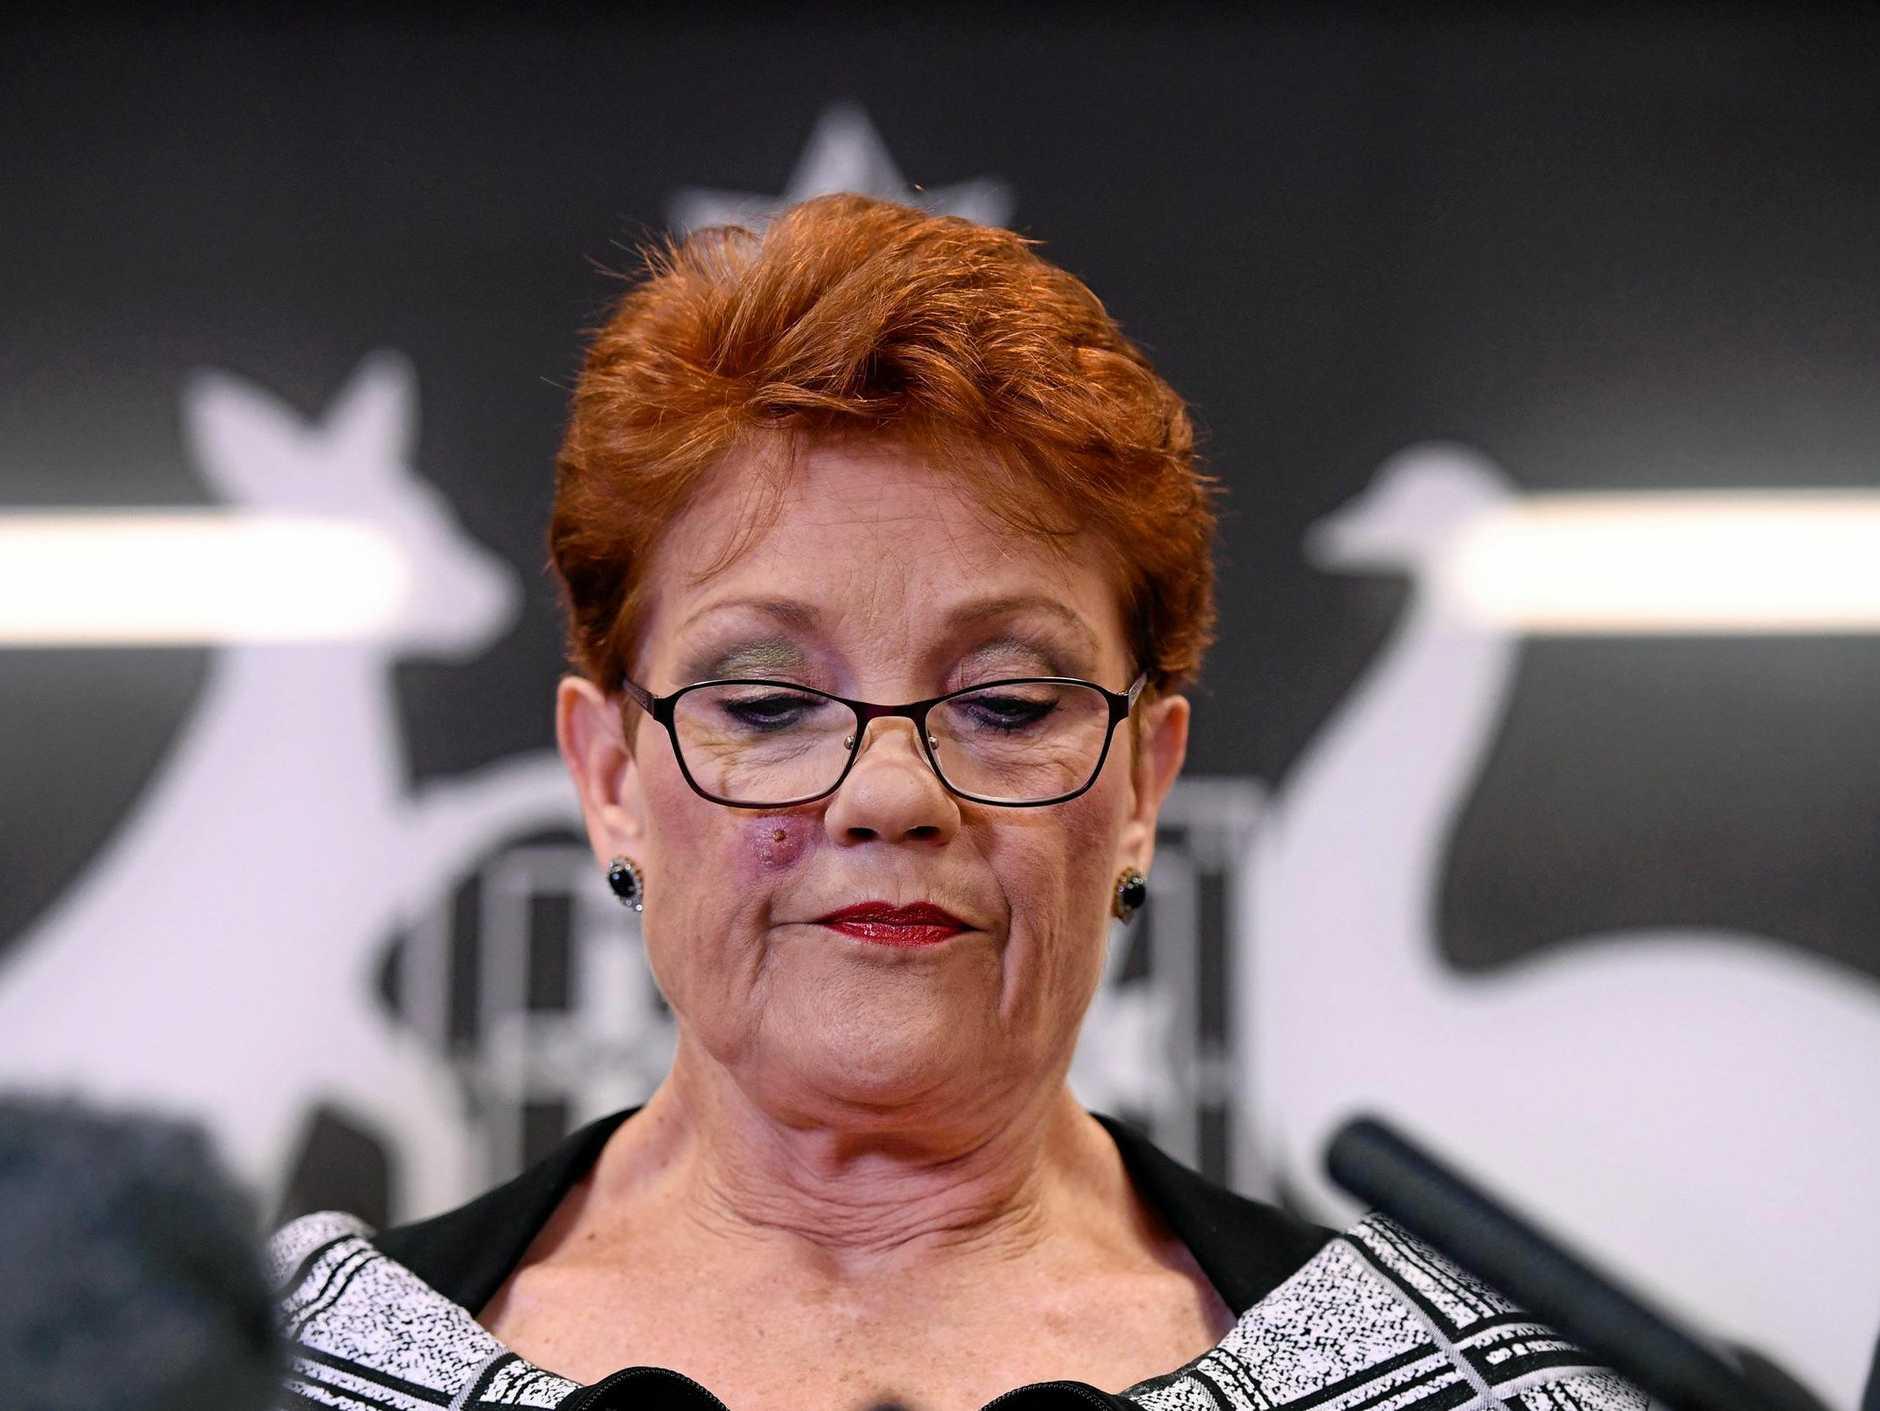 Queensland Senator and One Nation leader Pauline Hanson.